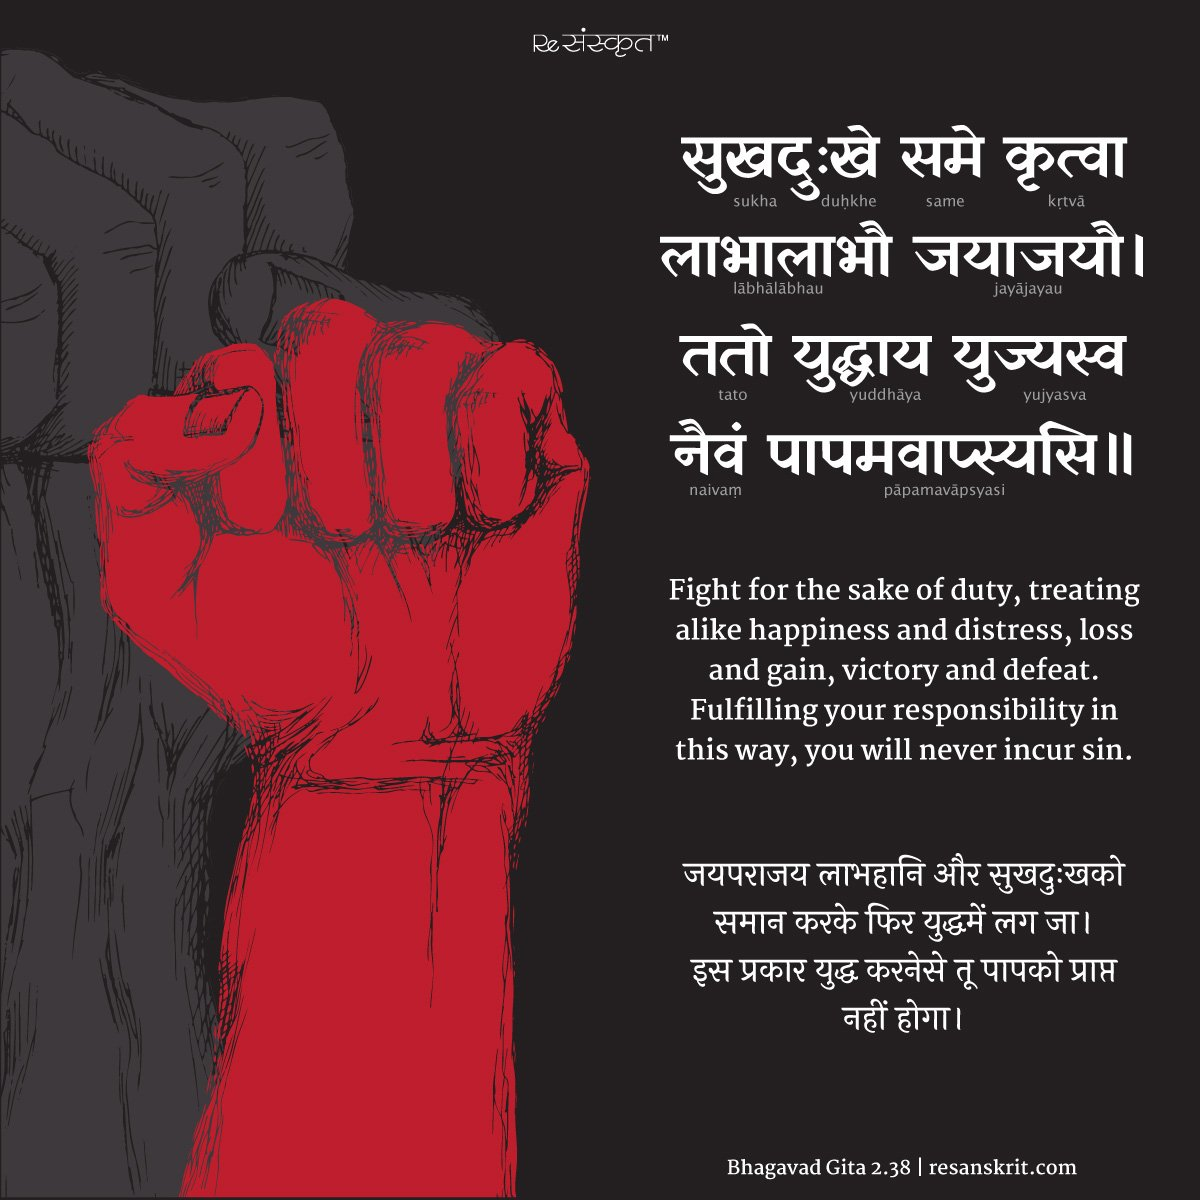 This shlok from Bhagavad Gita shows us a simple and effective way of fighting any battle.  #sanskrit #india #BhagavadGita #Gita #quotes #quotestoliveby #meditation #krishna #gita #sayings #teachings<br>http://pic.twitter.com/ECMQvgjqHo